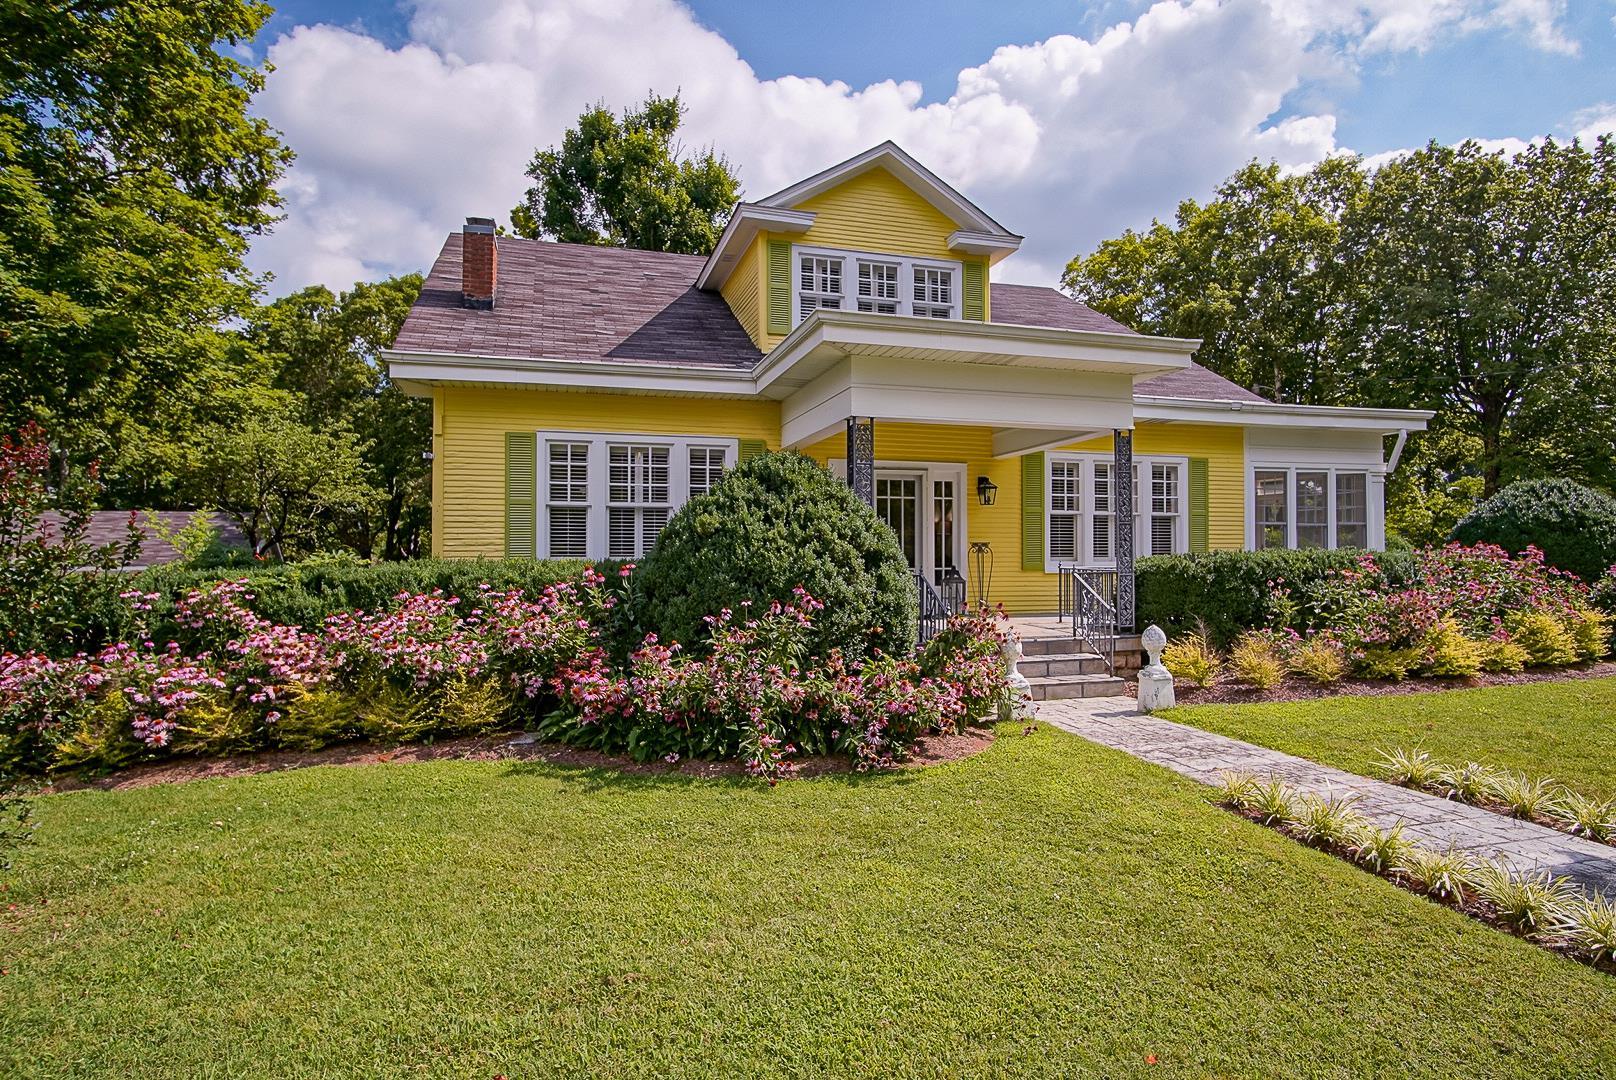 338 E Jefferson St, Pulaski, TN 38478 - Pulaski, TN real estate listing